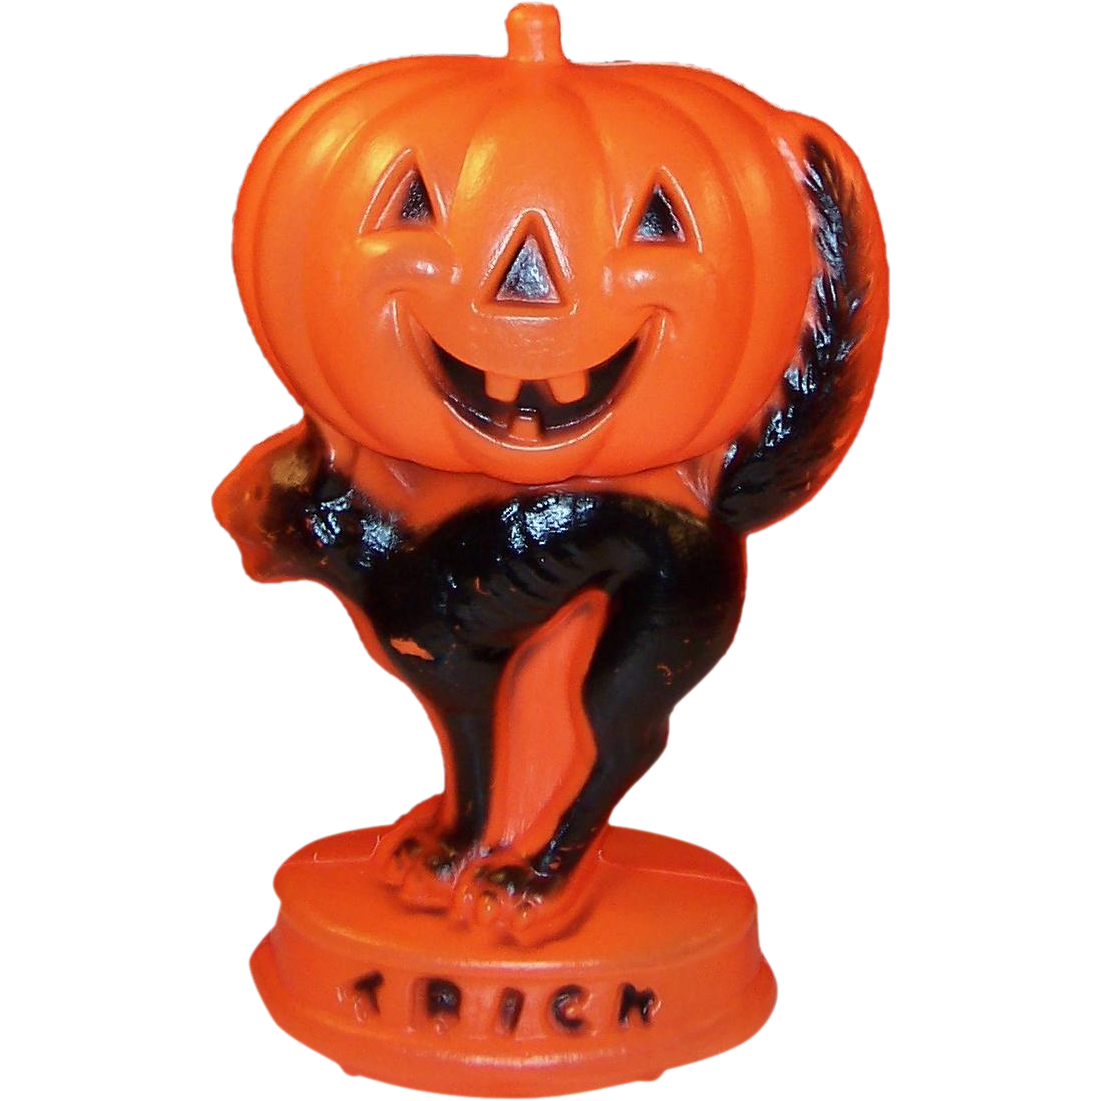 Vintage Halloween Light Up Blow Mold Jack-O-Lantern Pumpkin & Black Cat